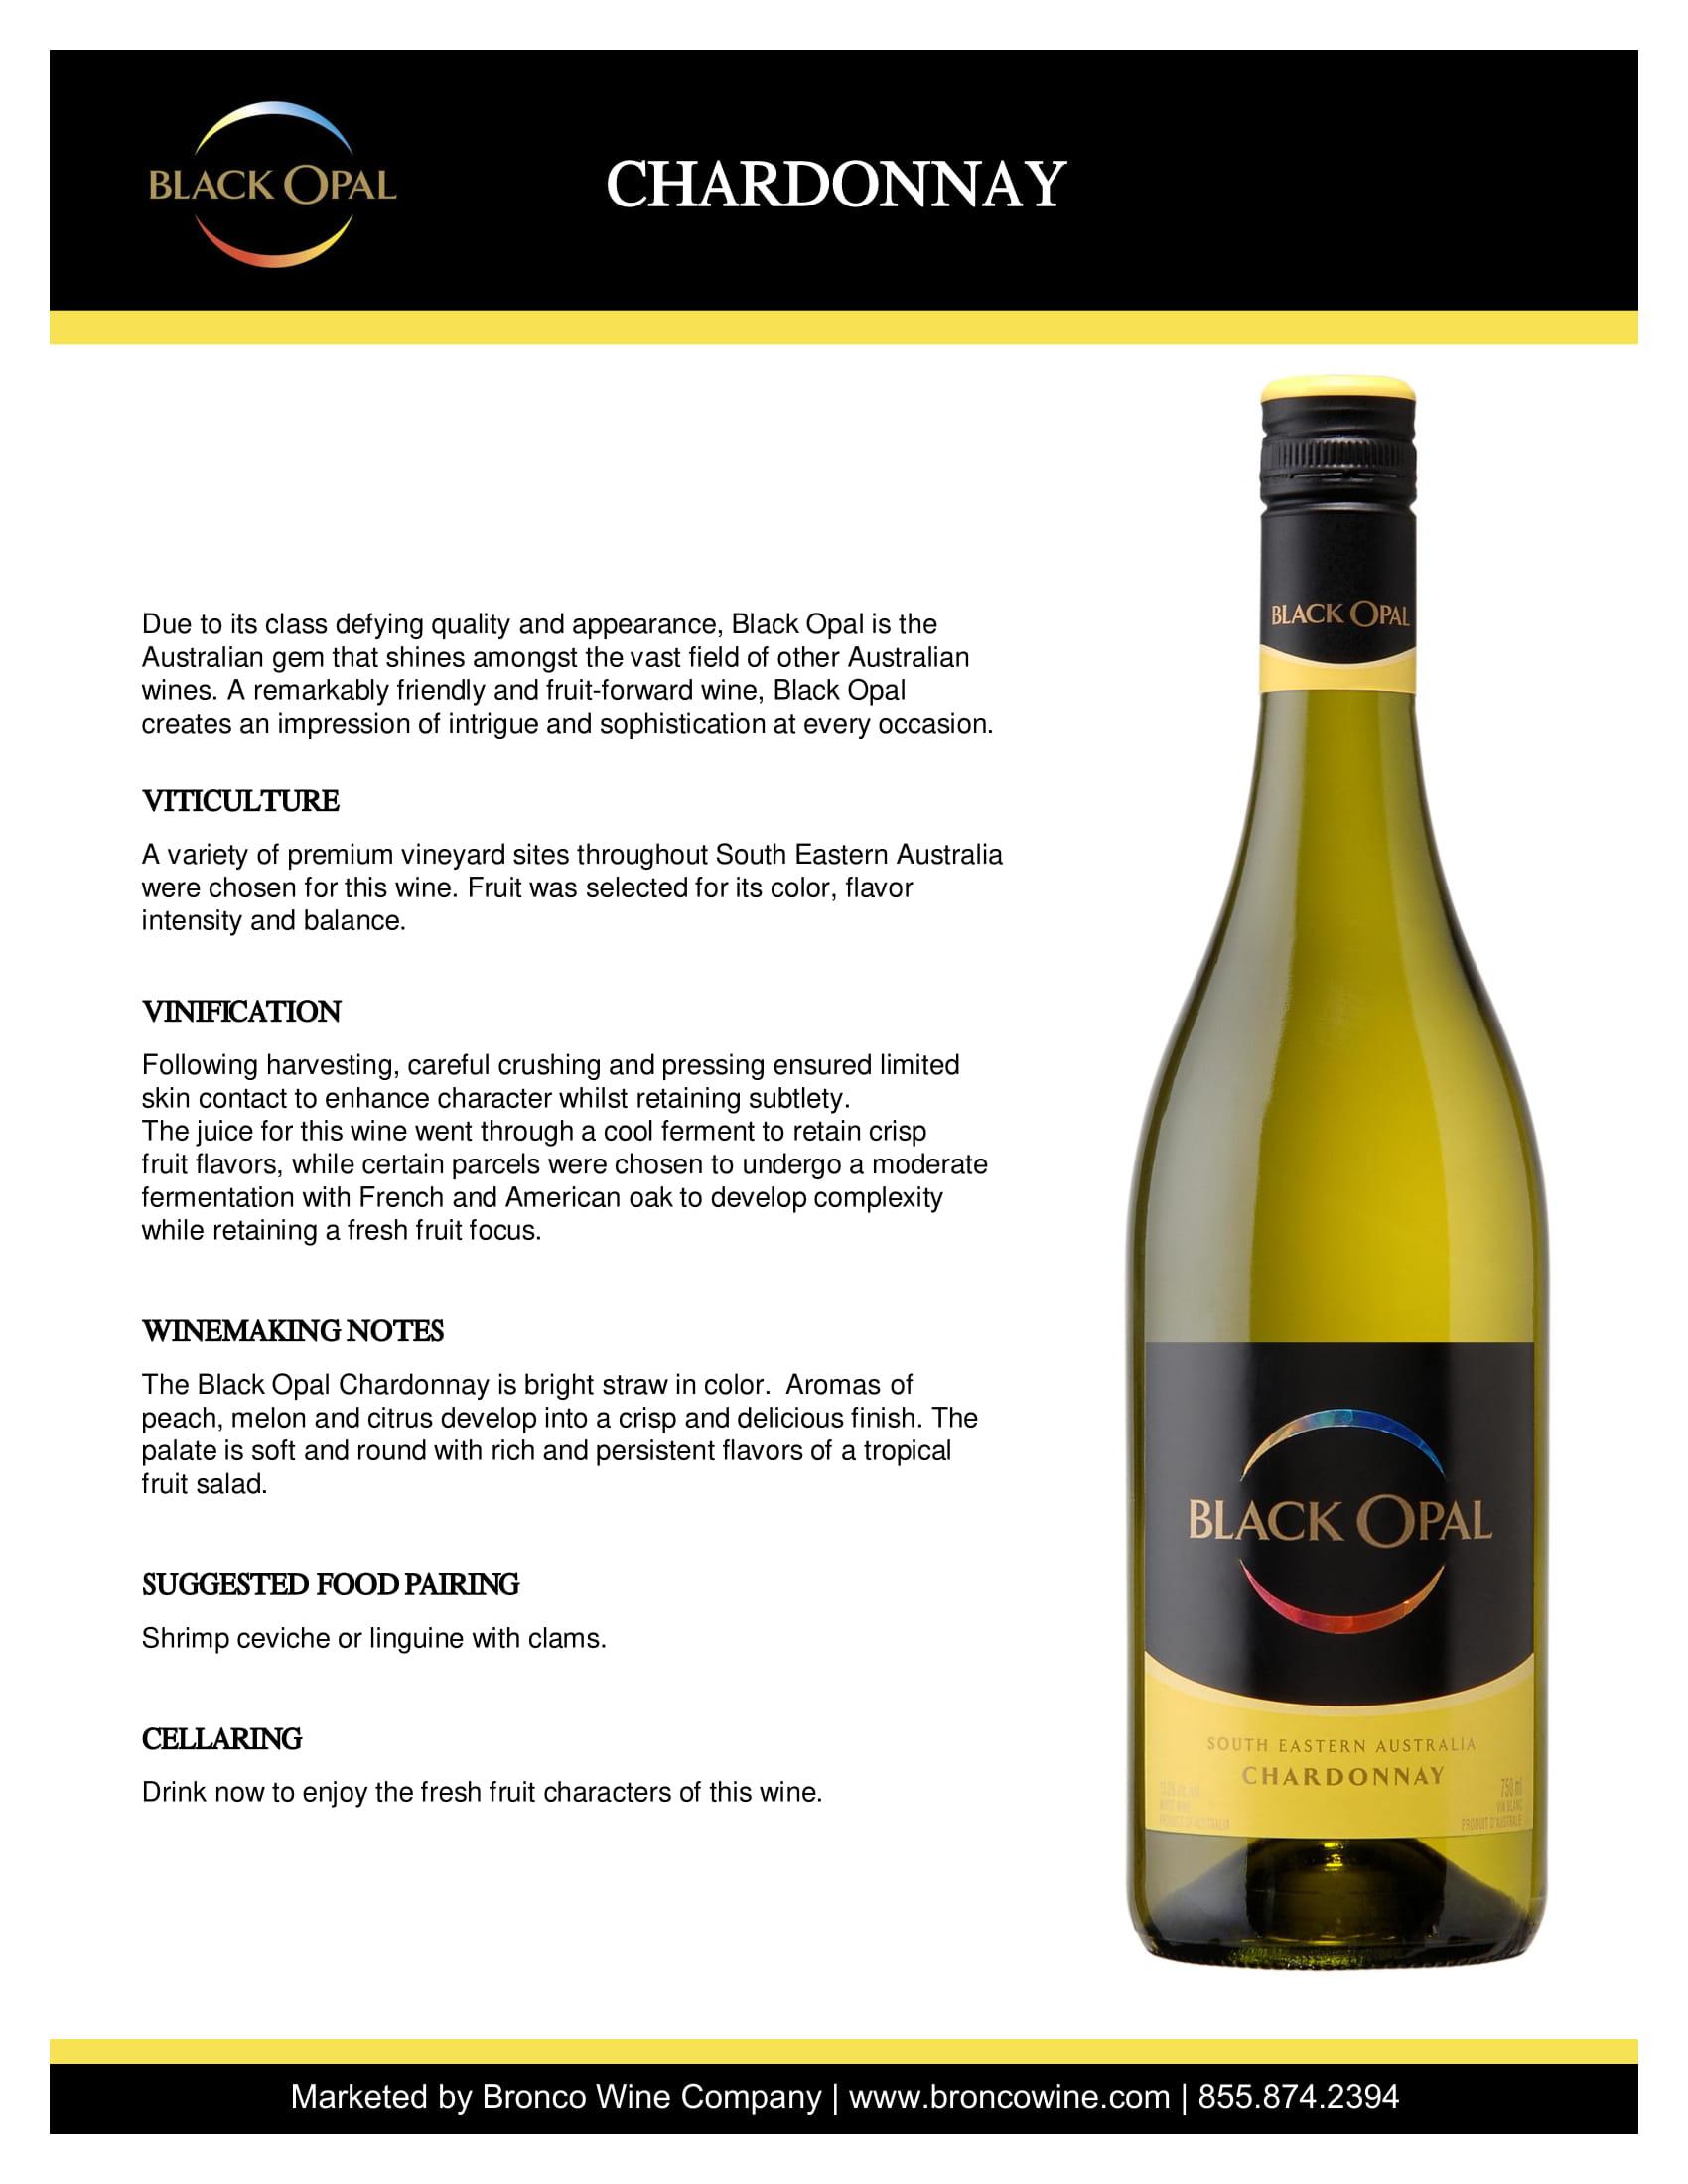 Black Opal Chardonnay Tech Sheet